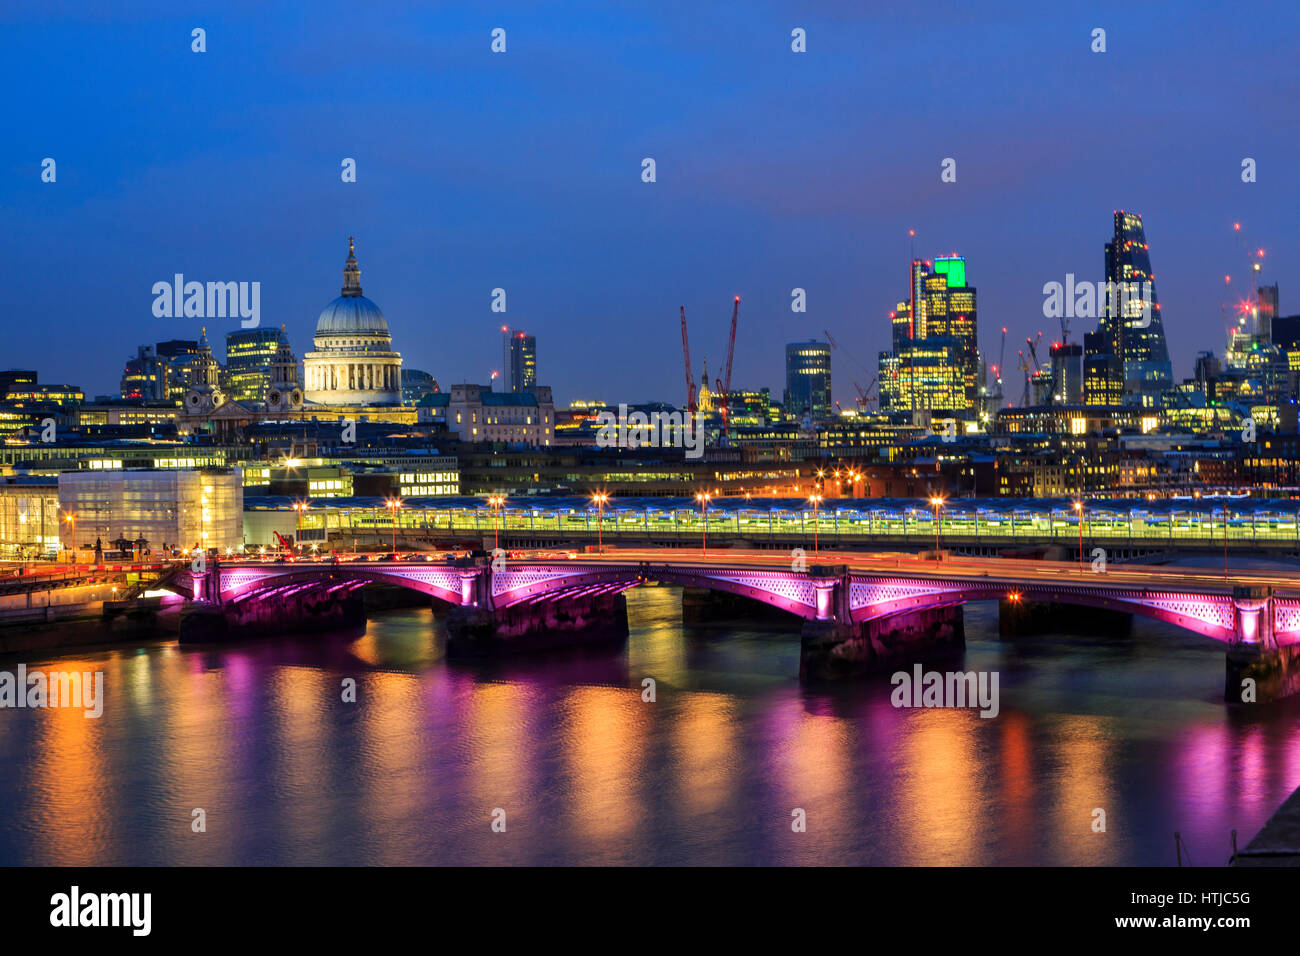 La Catedral de St Paul twilight panorama nocturno, Londres, Reino Unido Imagen De Stock